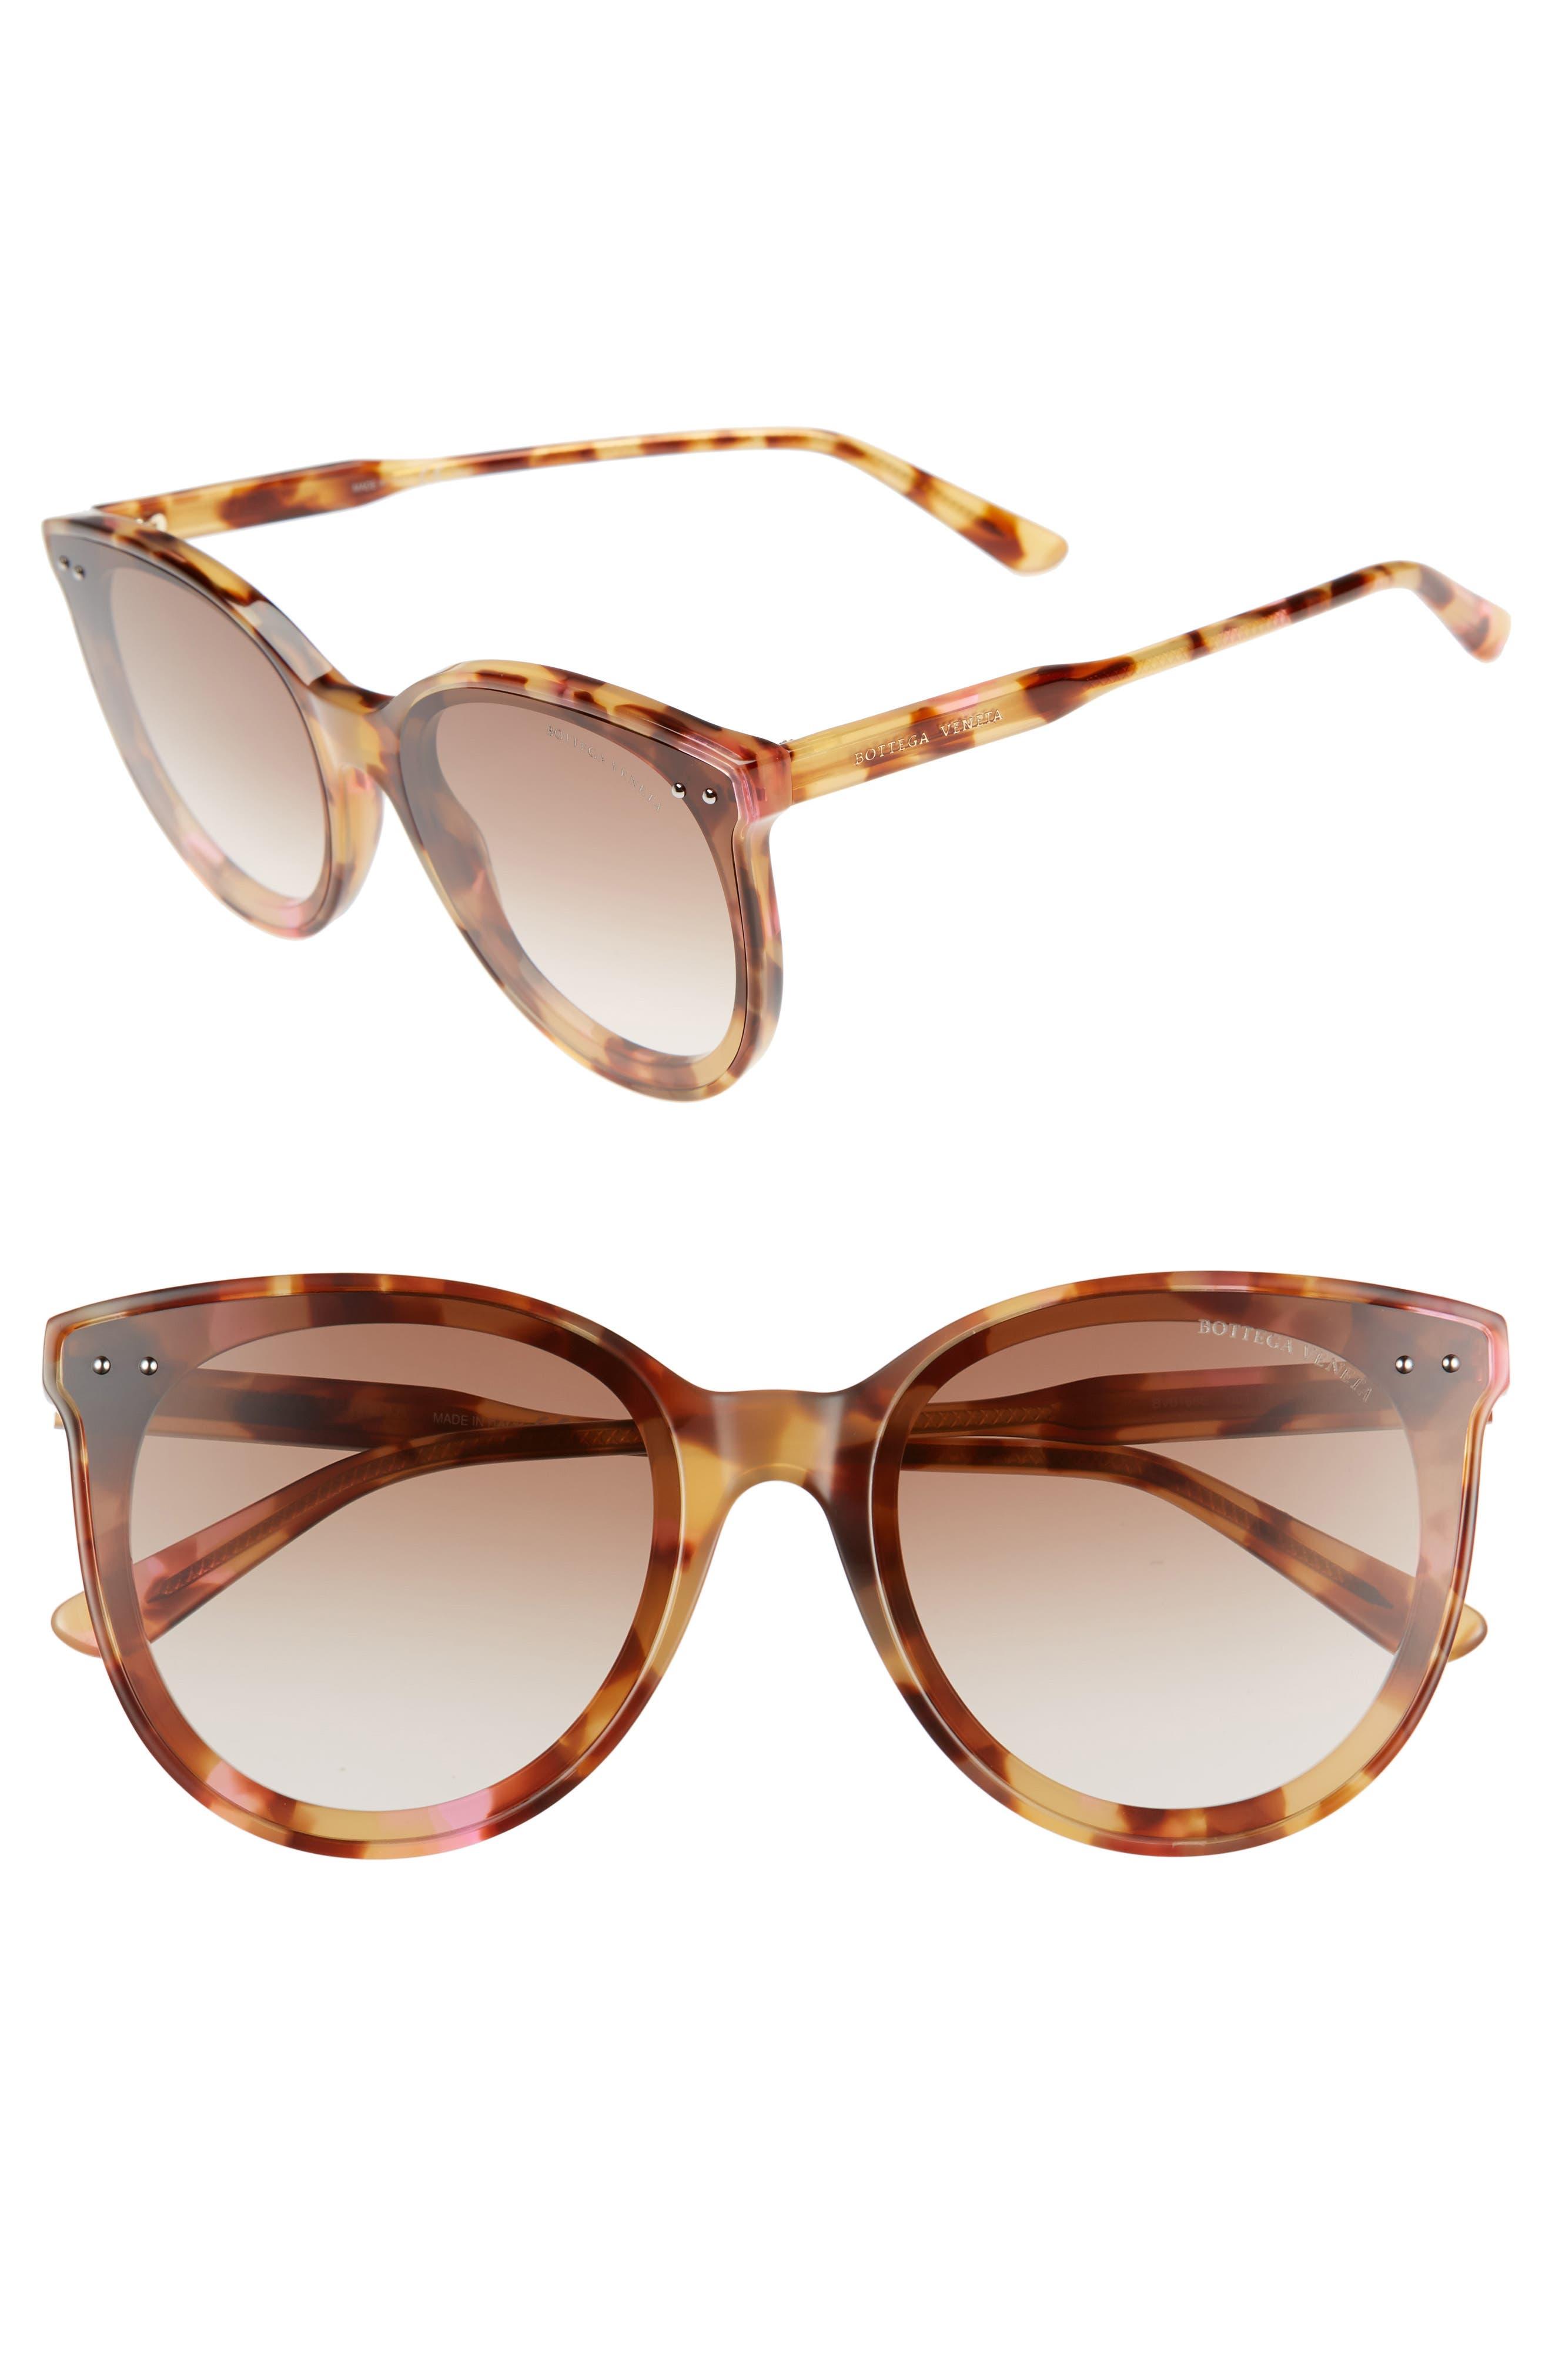 61mm Cat Eye Sunglasses,                         Main,                         color, PINK HAVANA